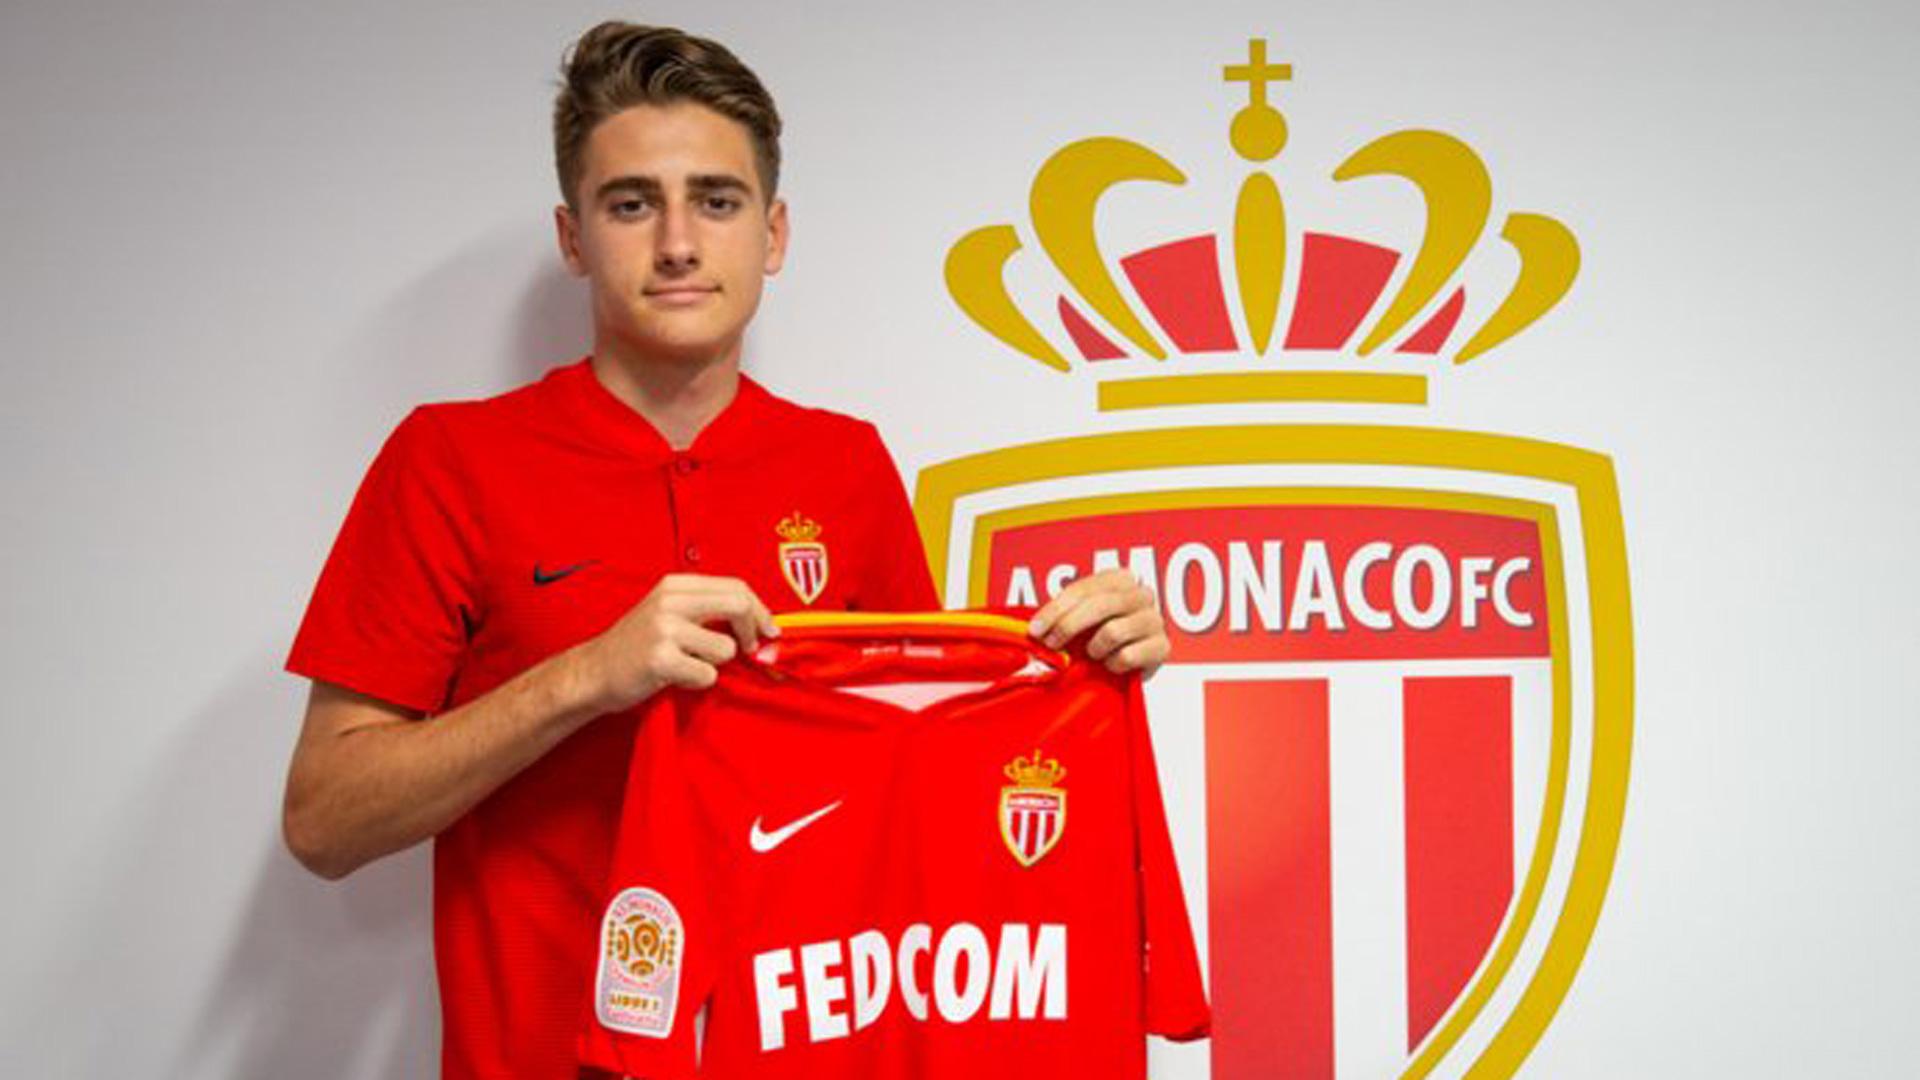 OFFICIEL : le jeune Robert Navarro (Monaco) rejoint la Real Sociedad